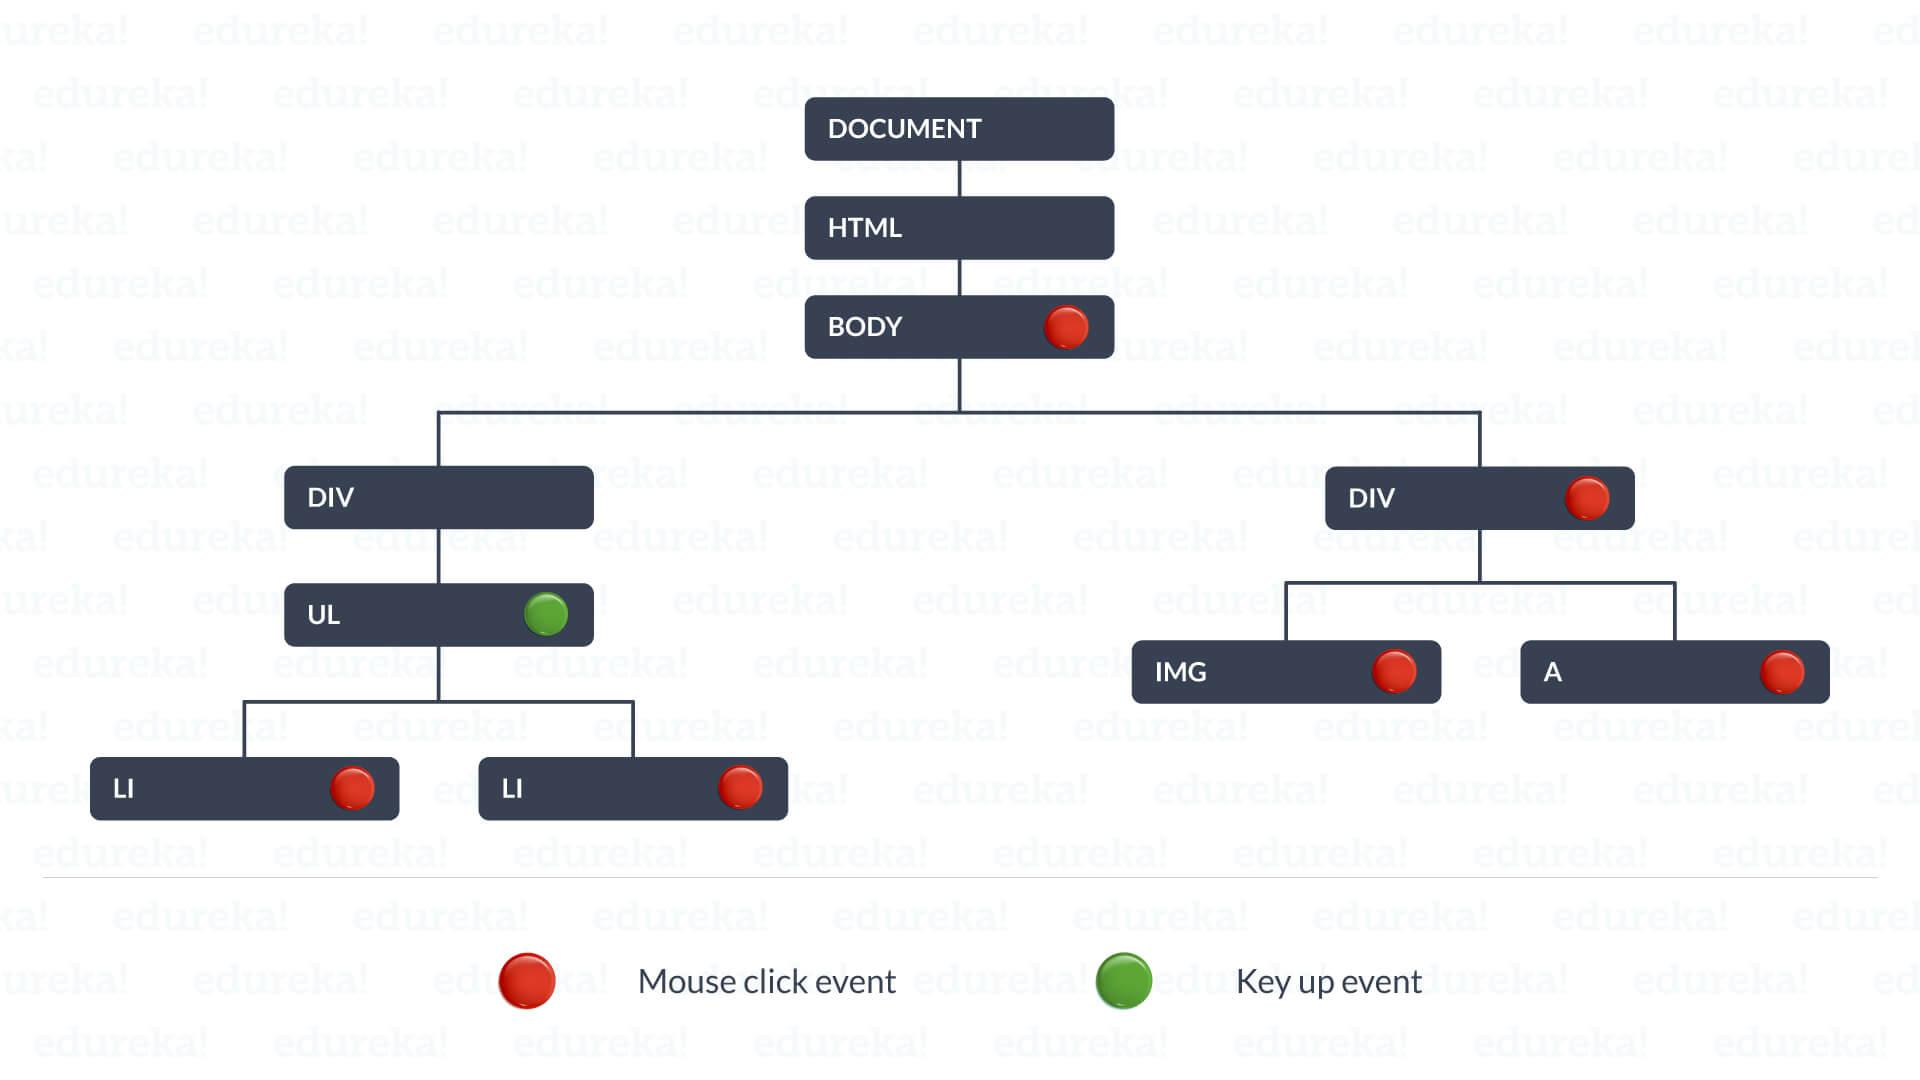 Event Bubbling and Event Capturing In JavaScript   Edureka